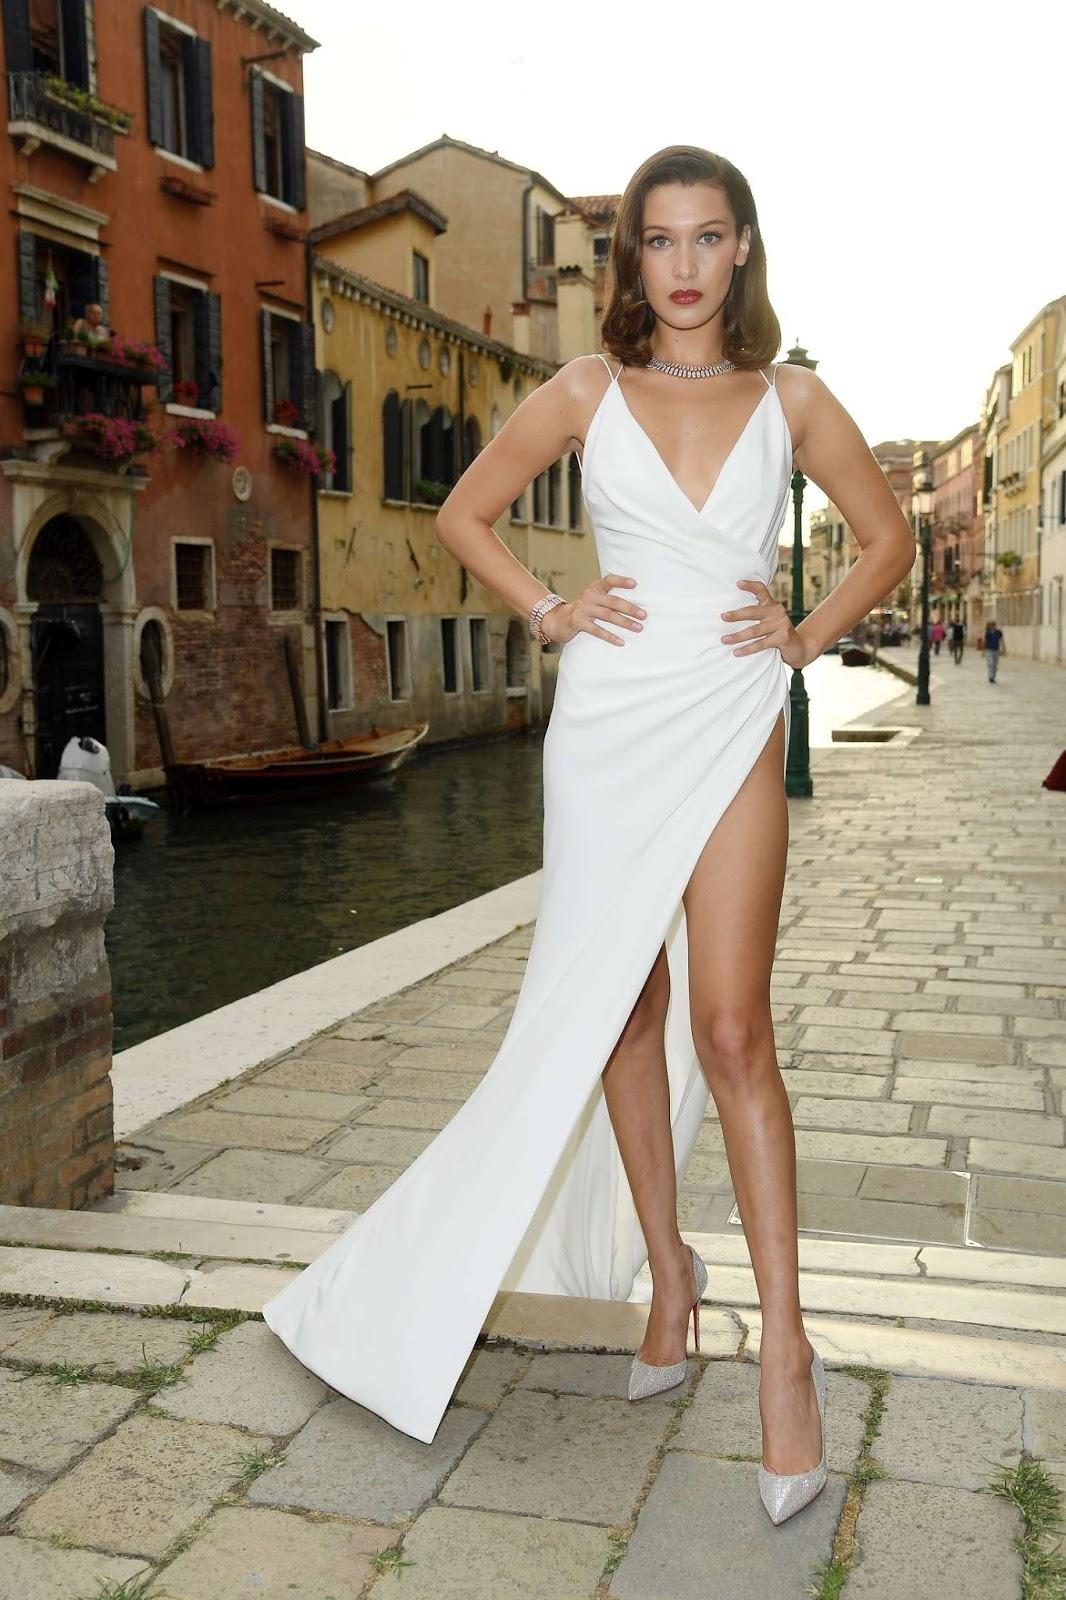 người mẫu Kendall Jenner 9